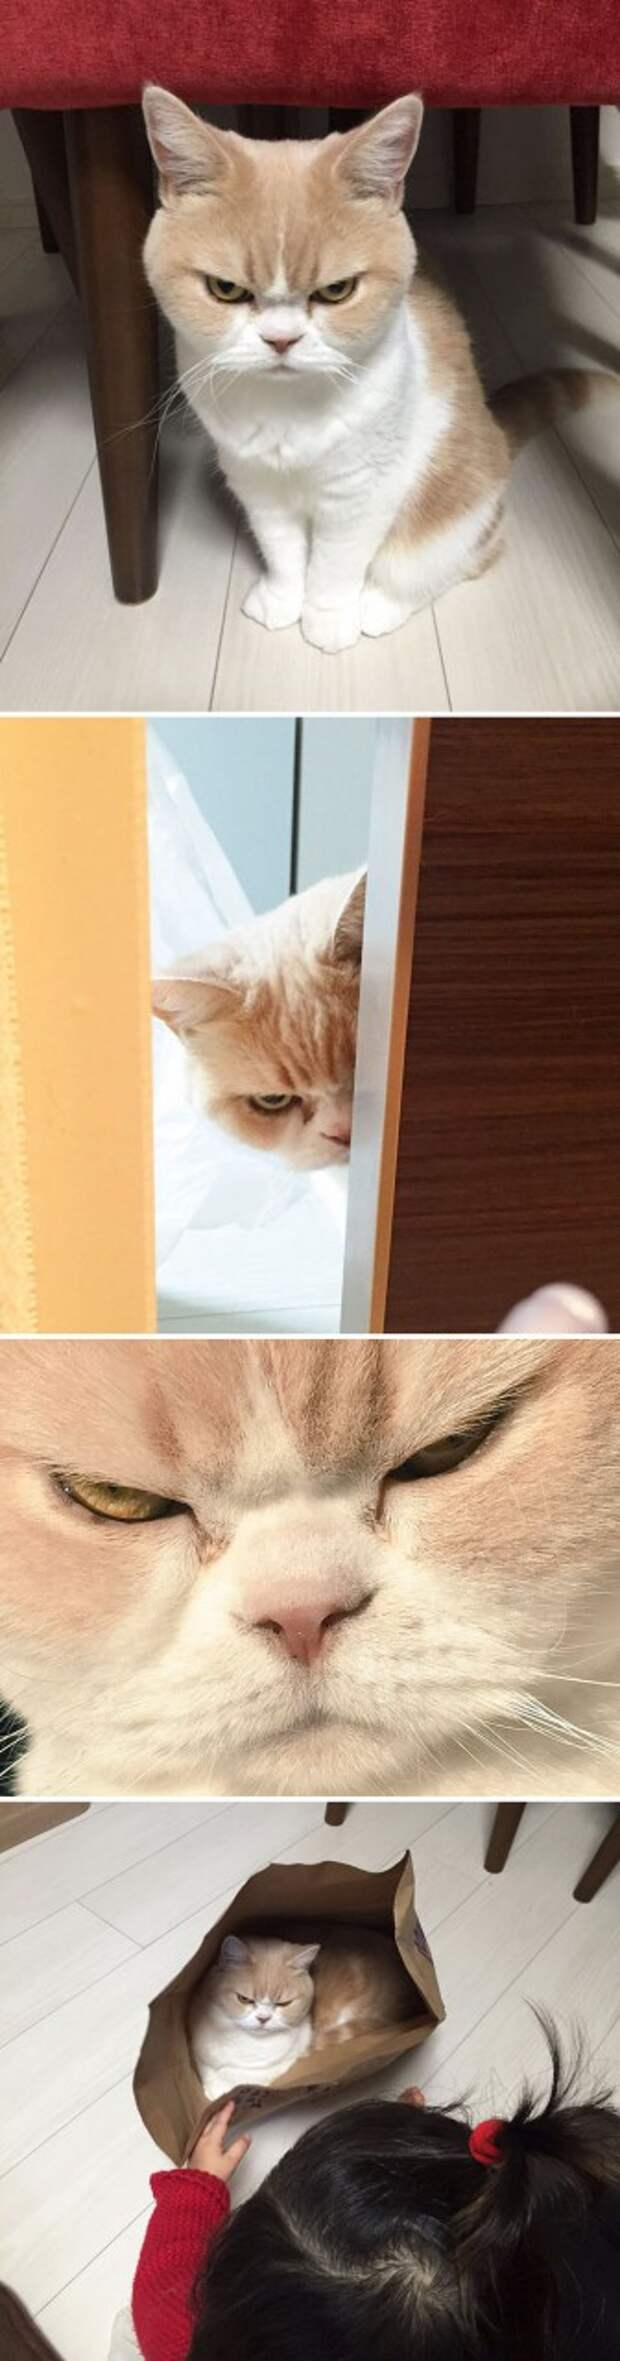 3. Пугающий взгляд.